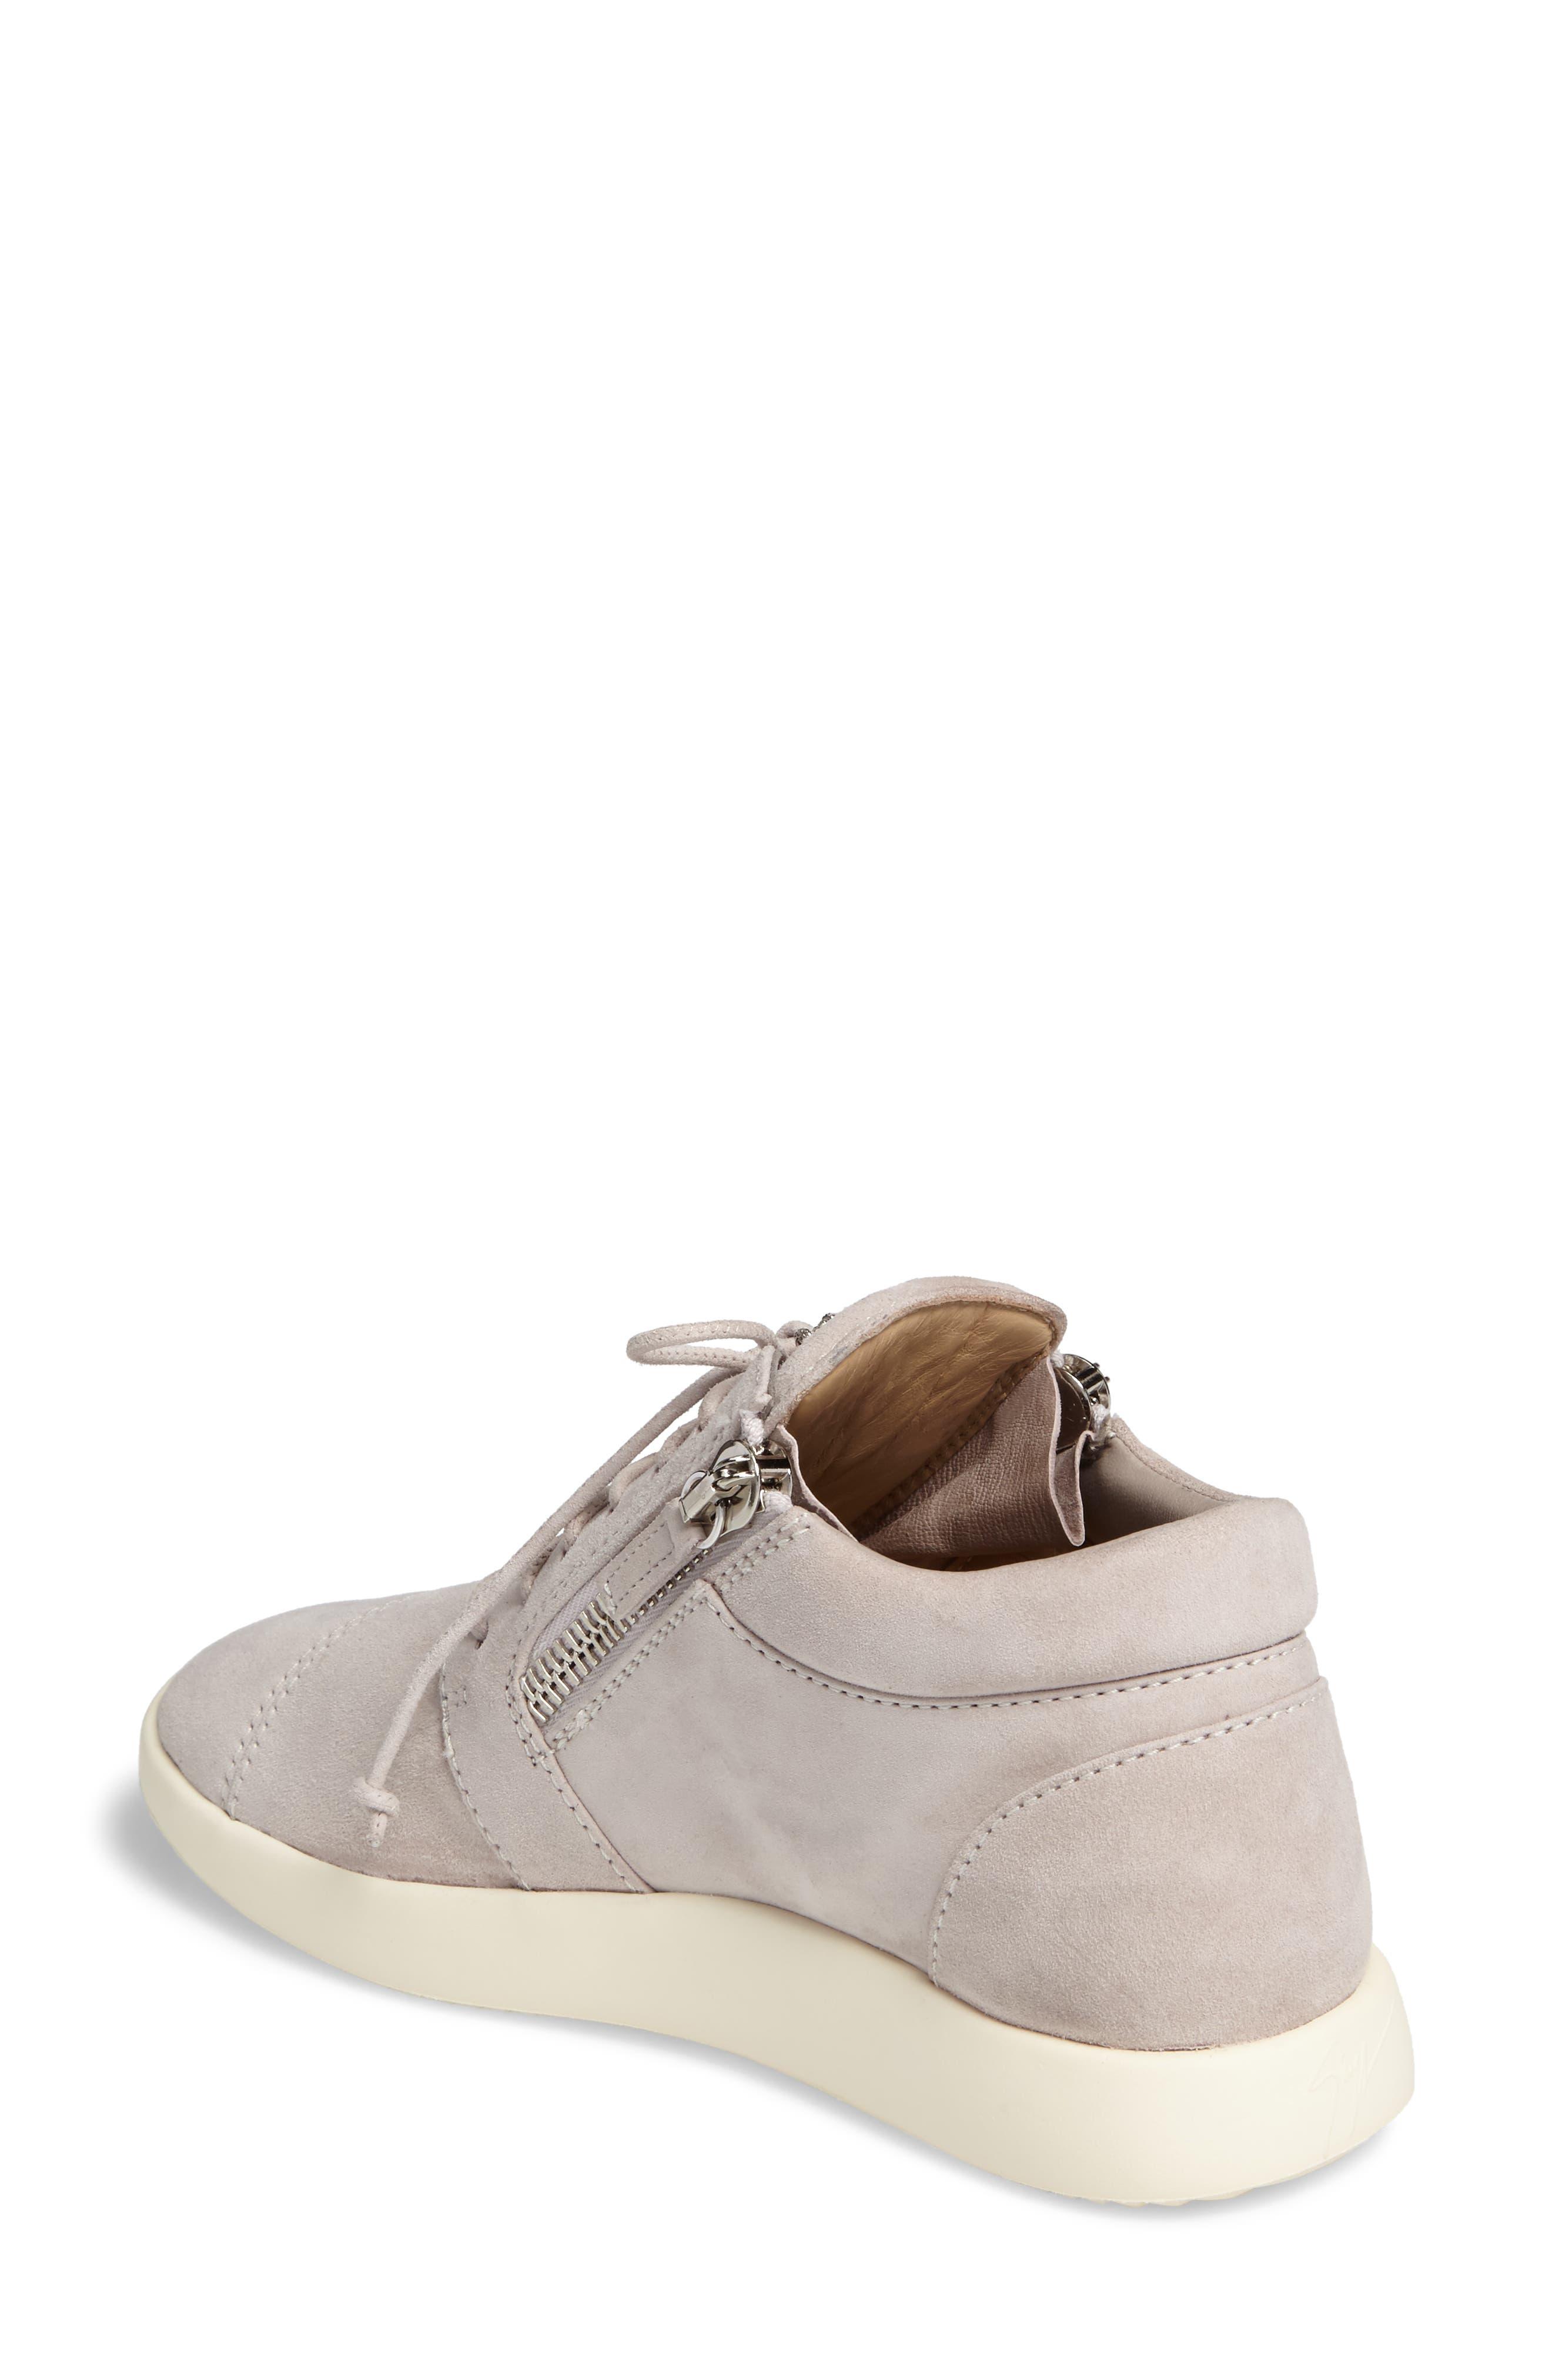 Zip Mid-Top Sneaker,                             Alternate thumbnail 2, color,                             Grey